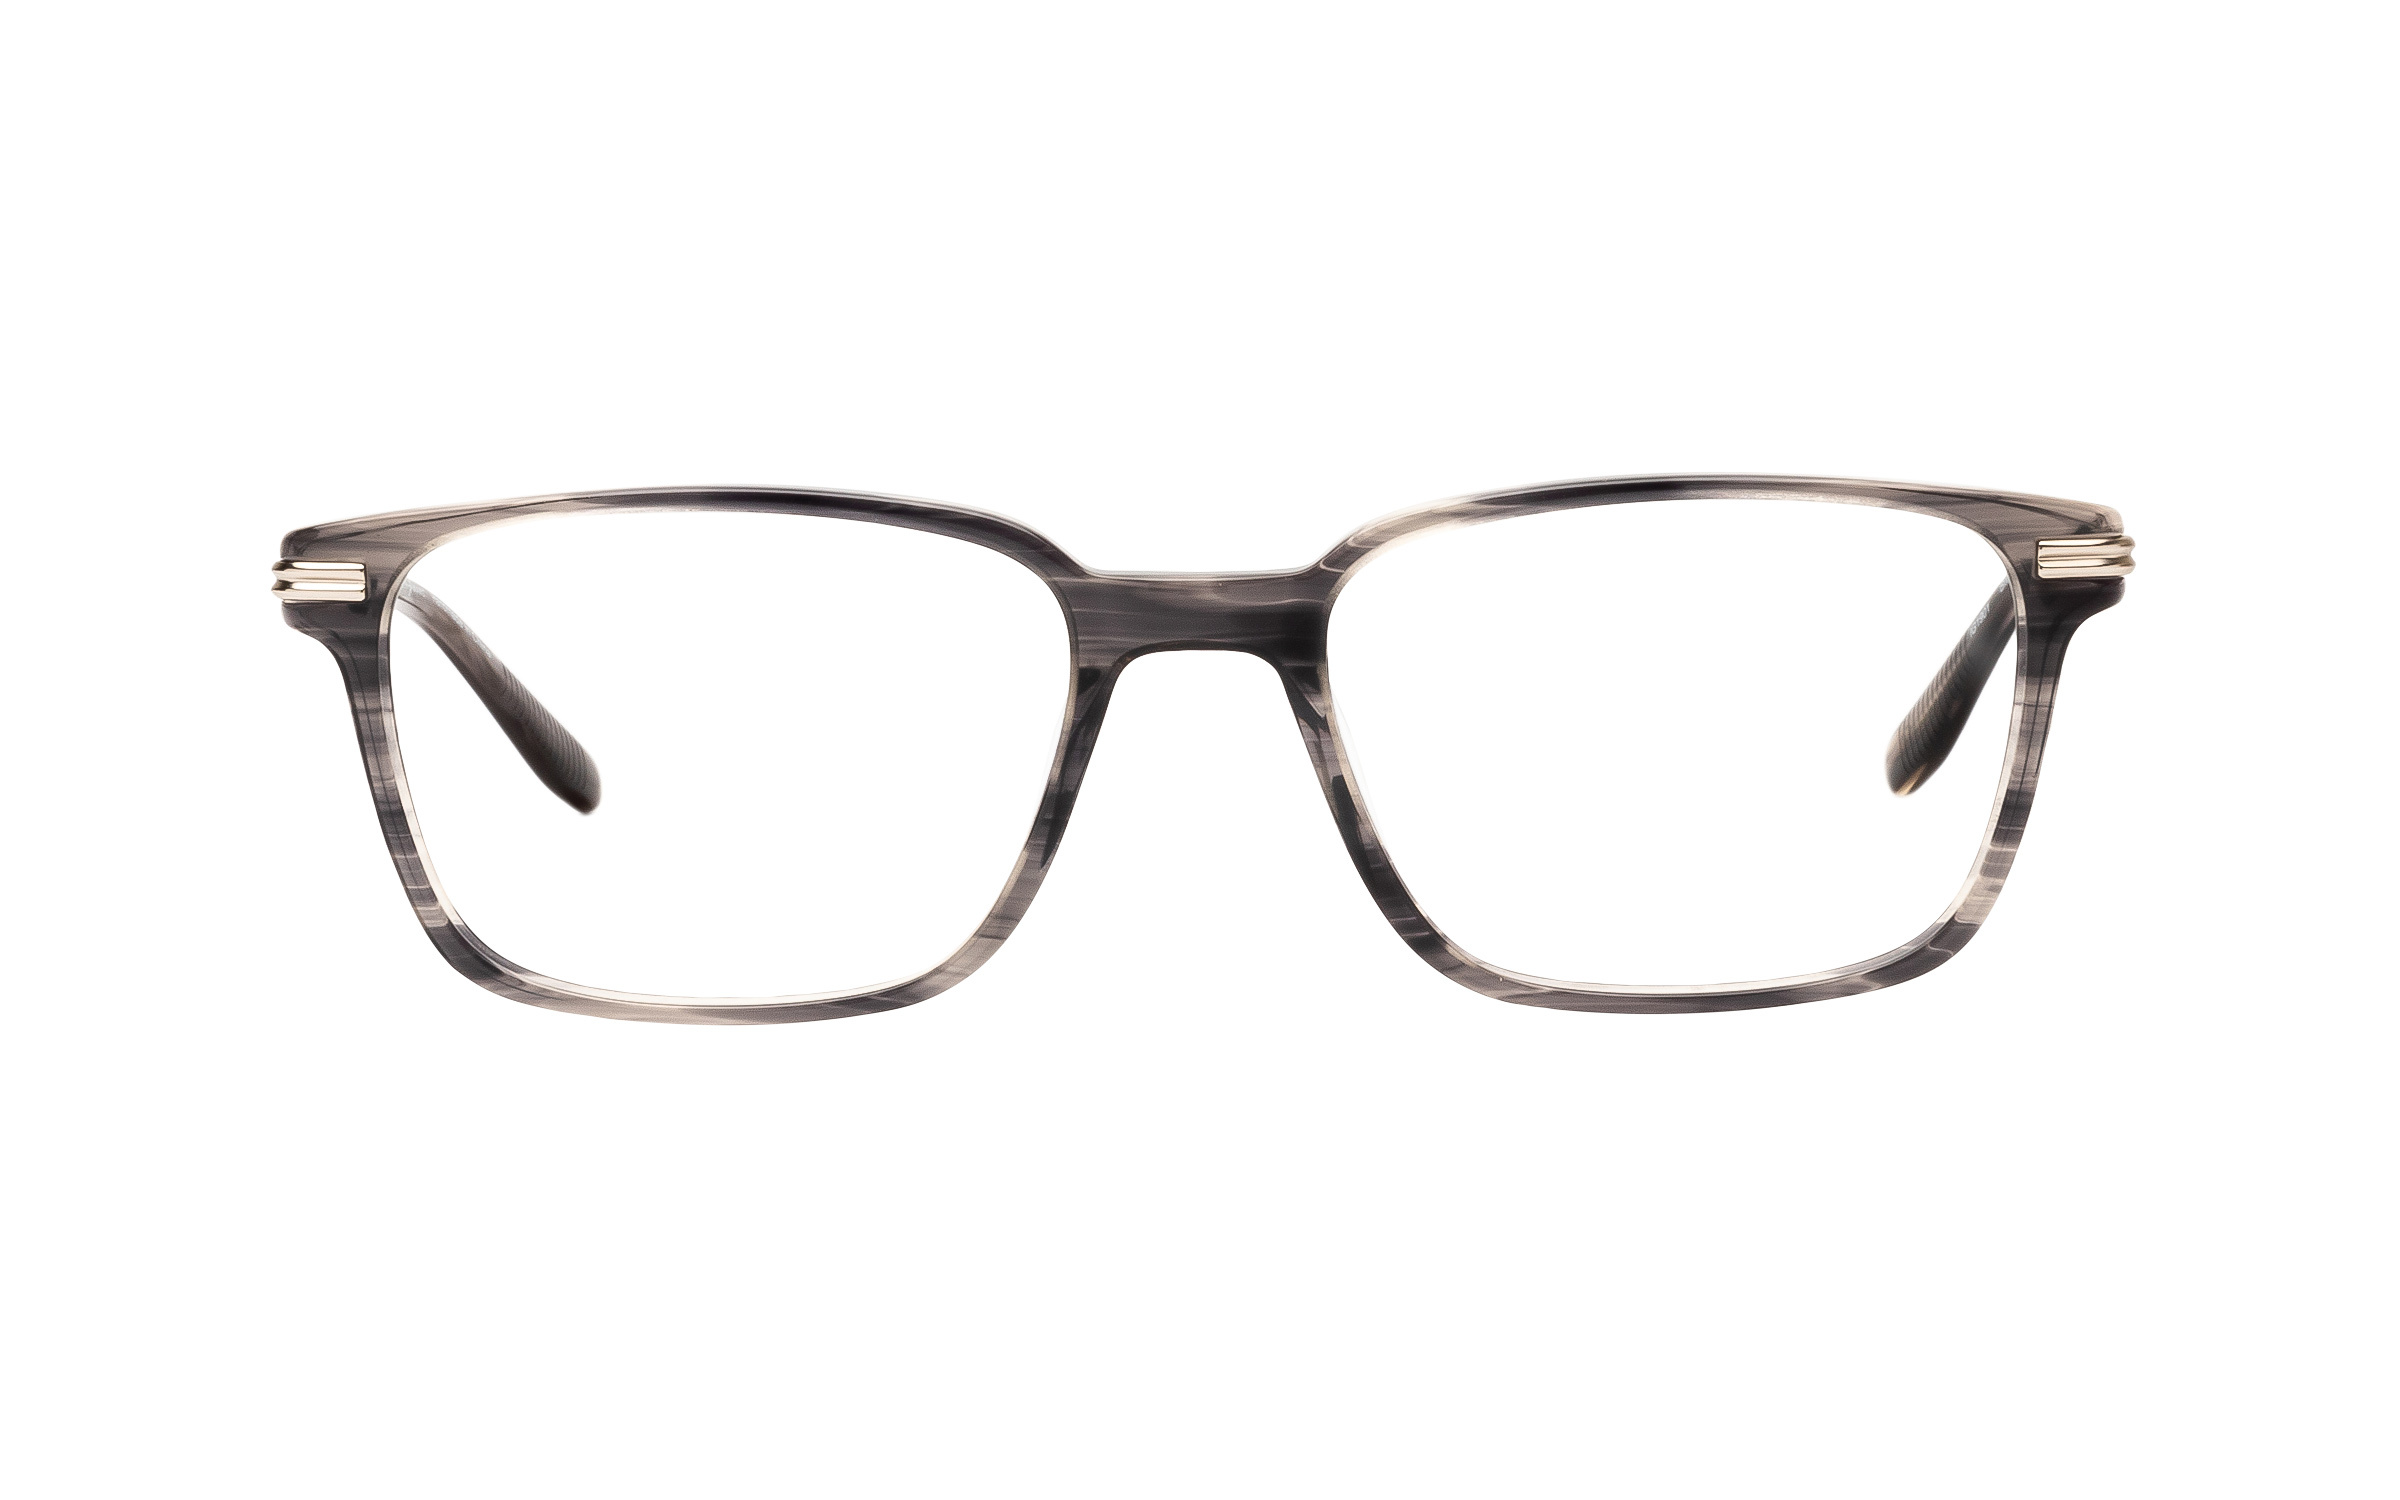 Joseph Marc Men's Bixby (55) Eyeglasses and Frame in Grey Brown Horn | Acetate/Metal